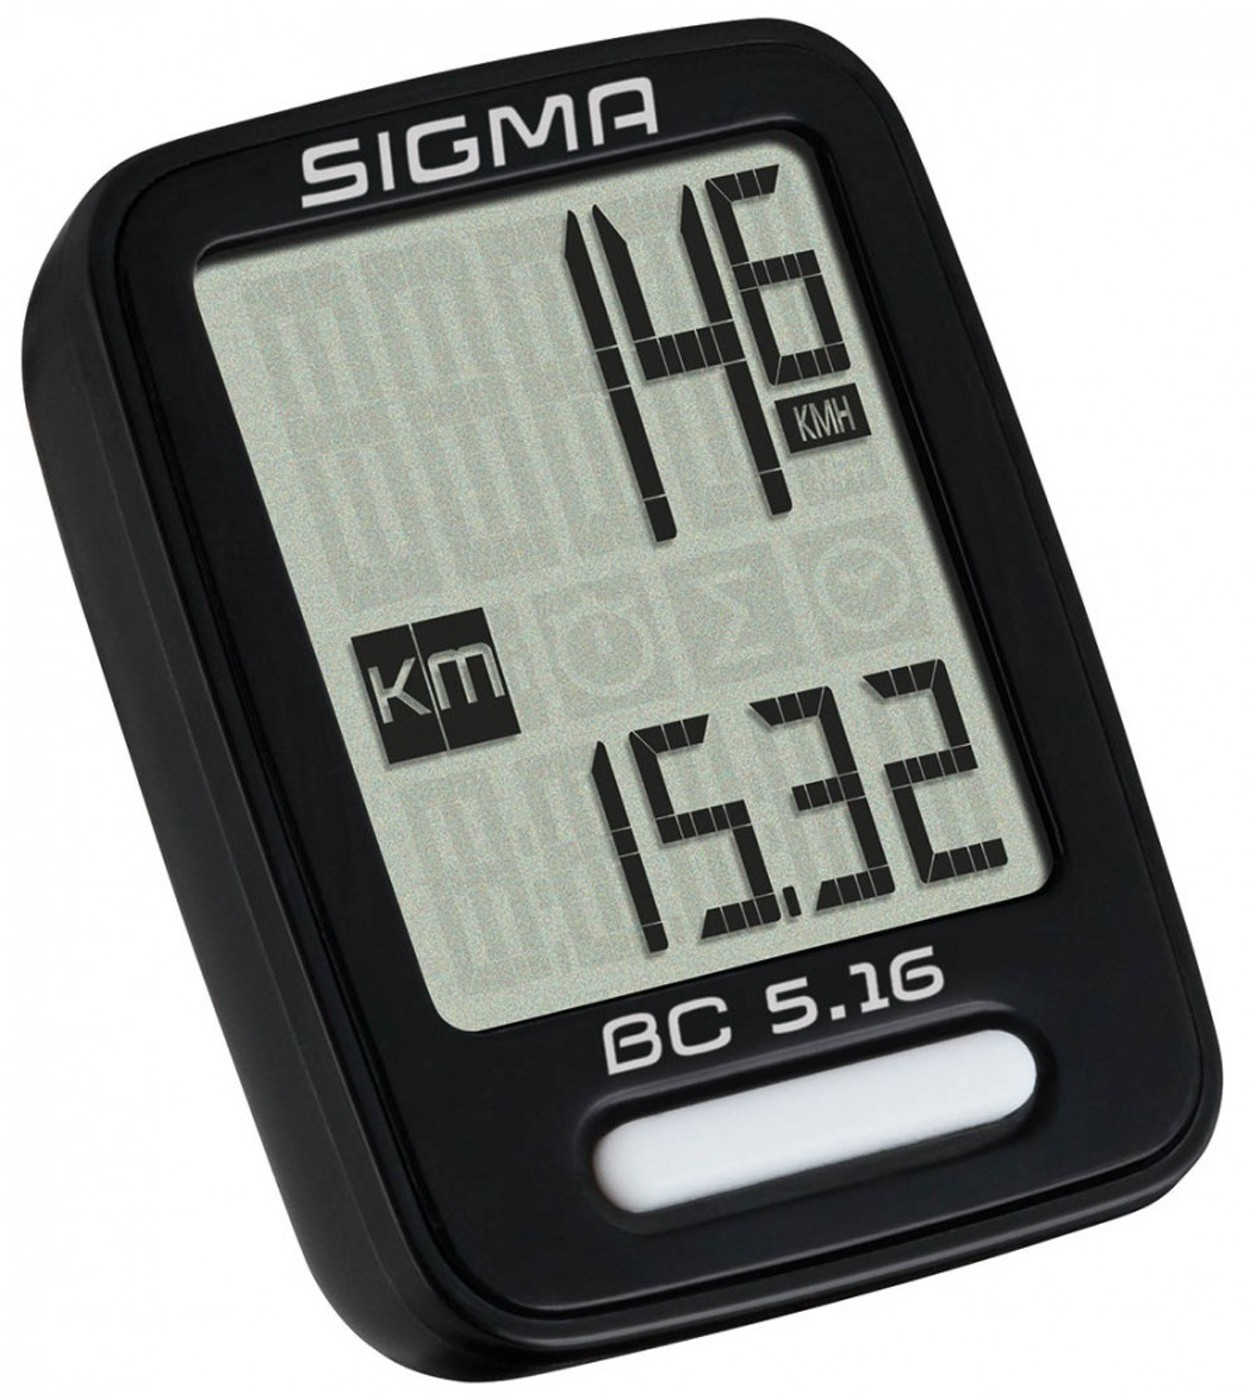 SIGMA TOP LINE BC 5.16